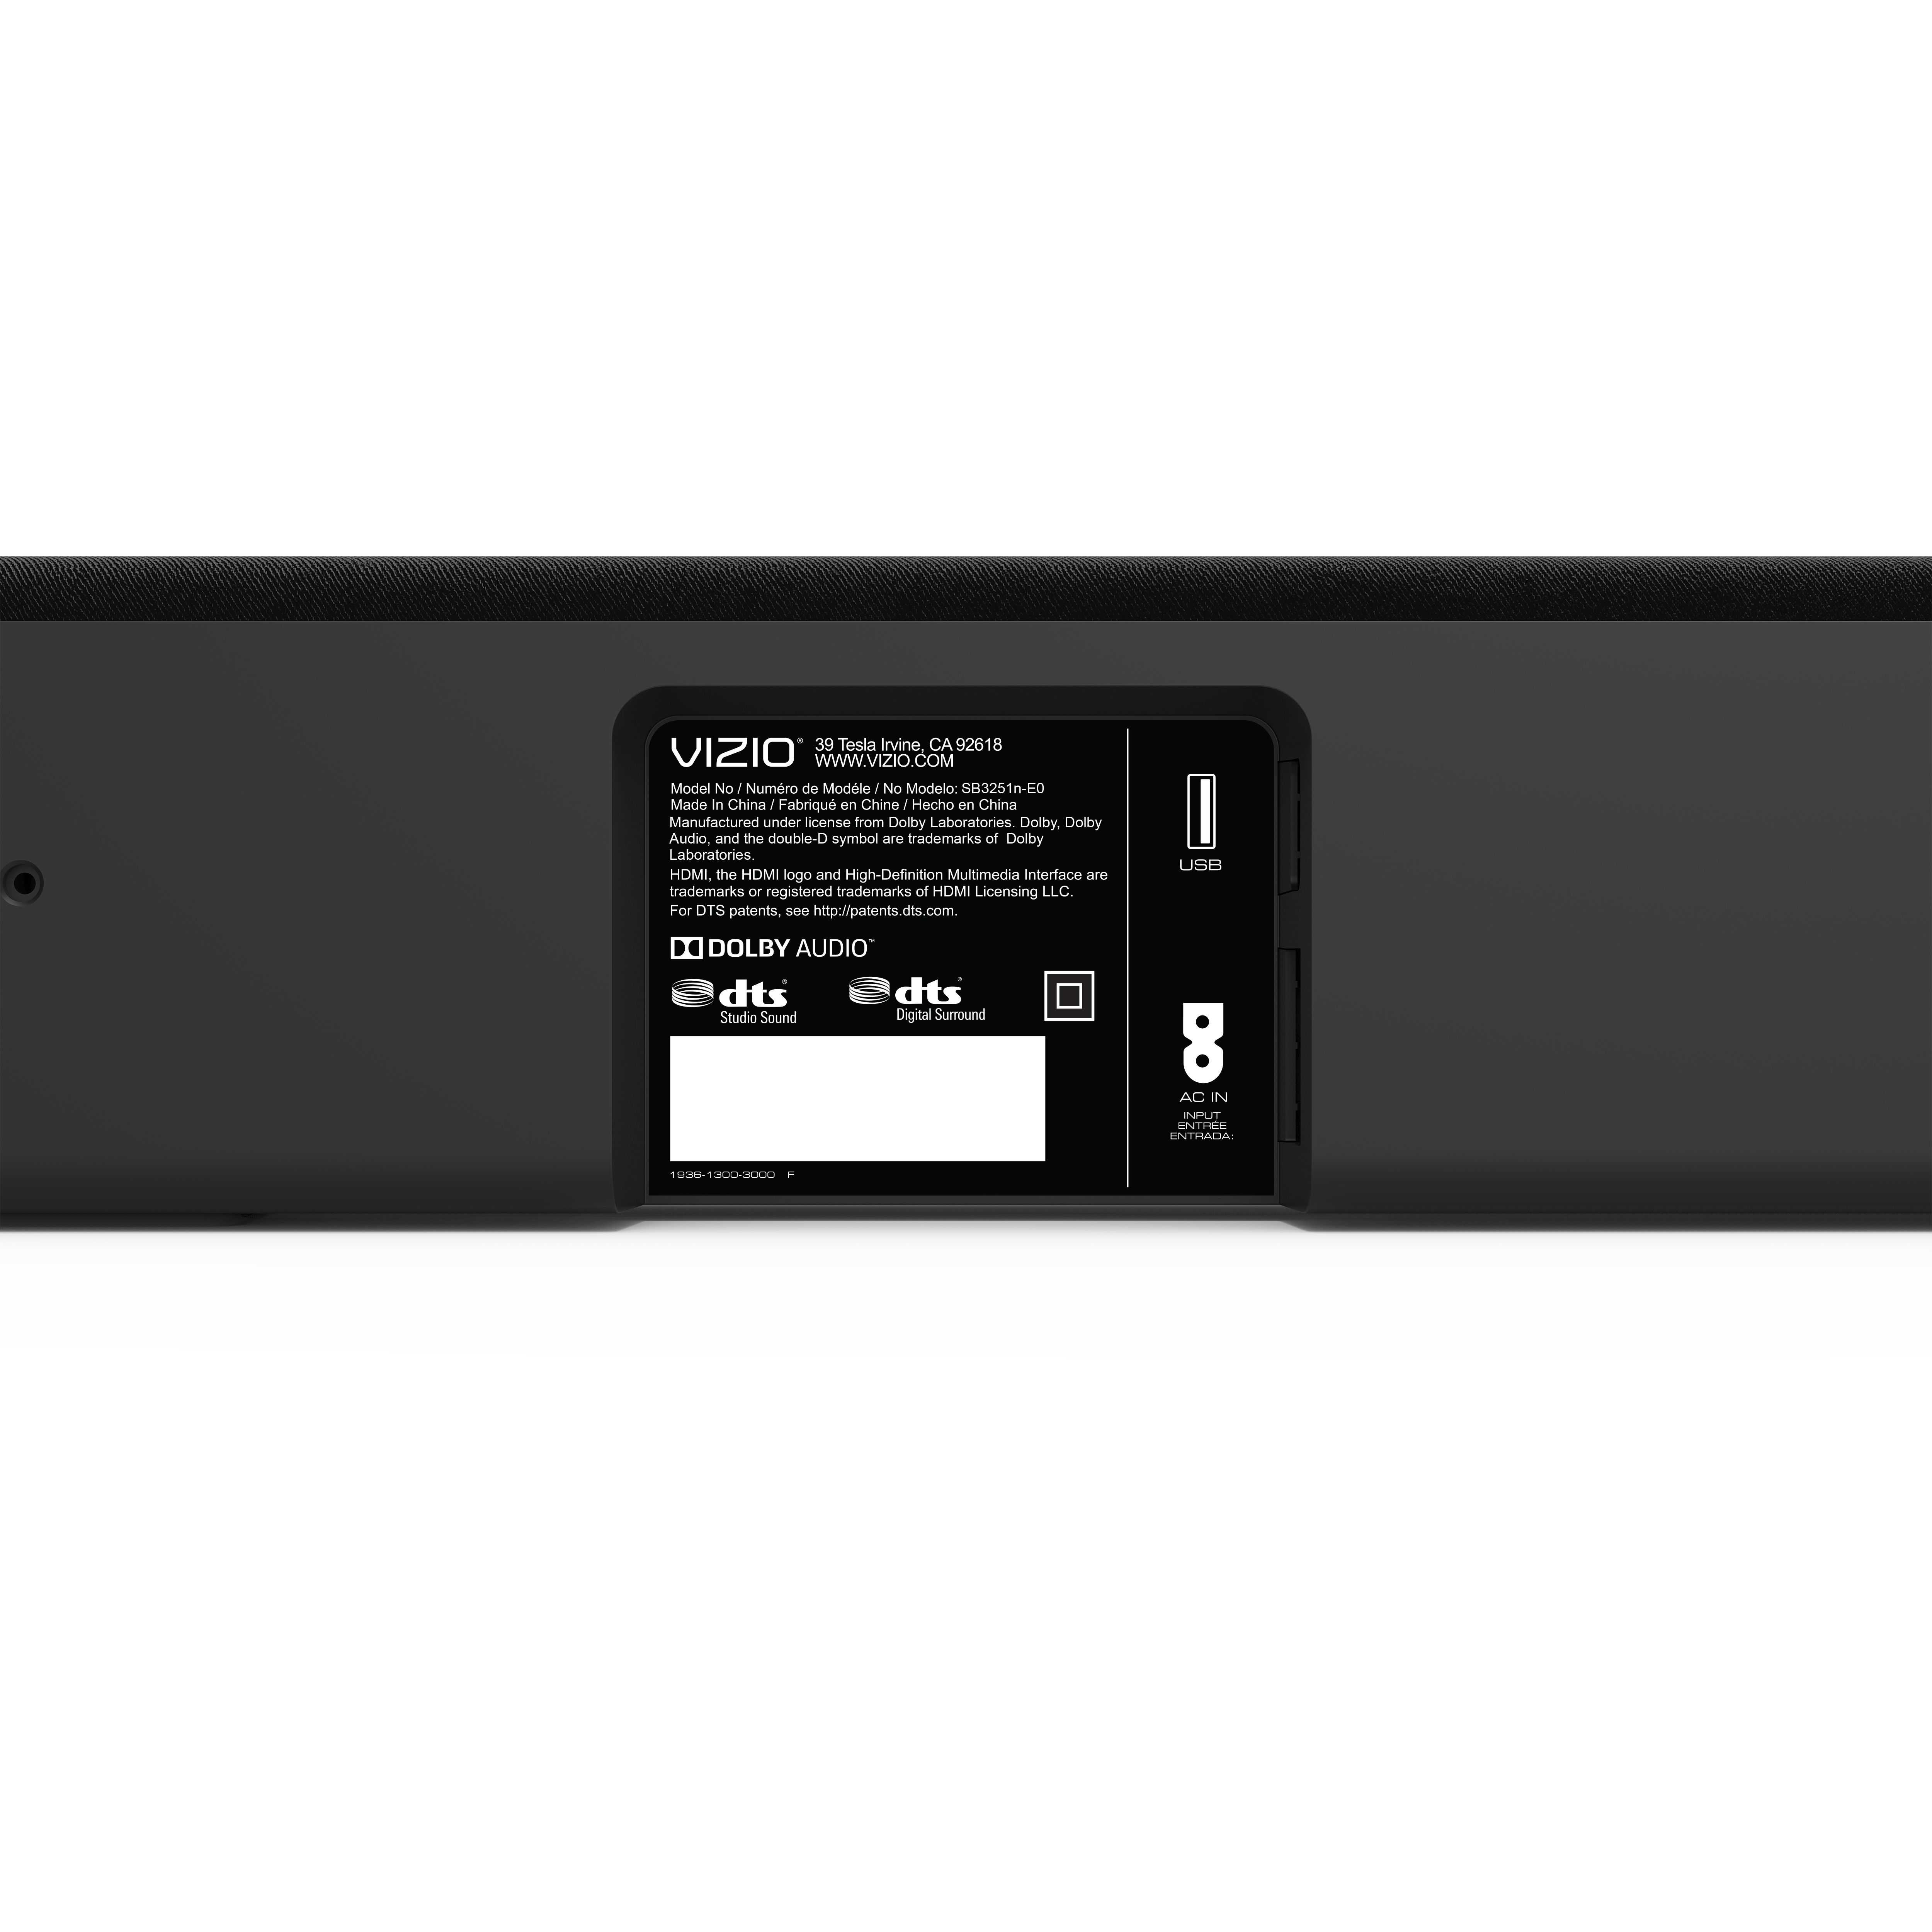 Vizio 32 5 1 Channel Soundbar System With Wireless Subwoofer And Rear Speakers Sb3251n E0 Walmart Com Subwoofer Sound Bar Rear Speakers